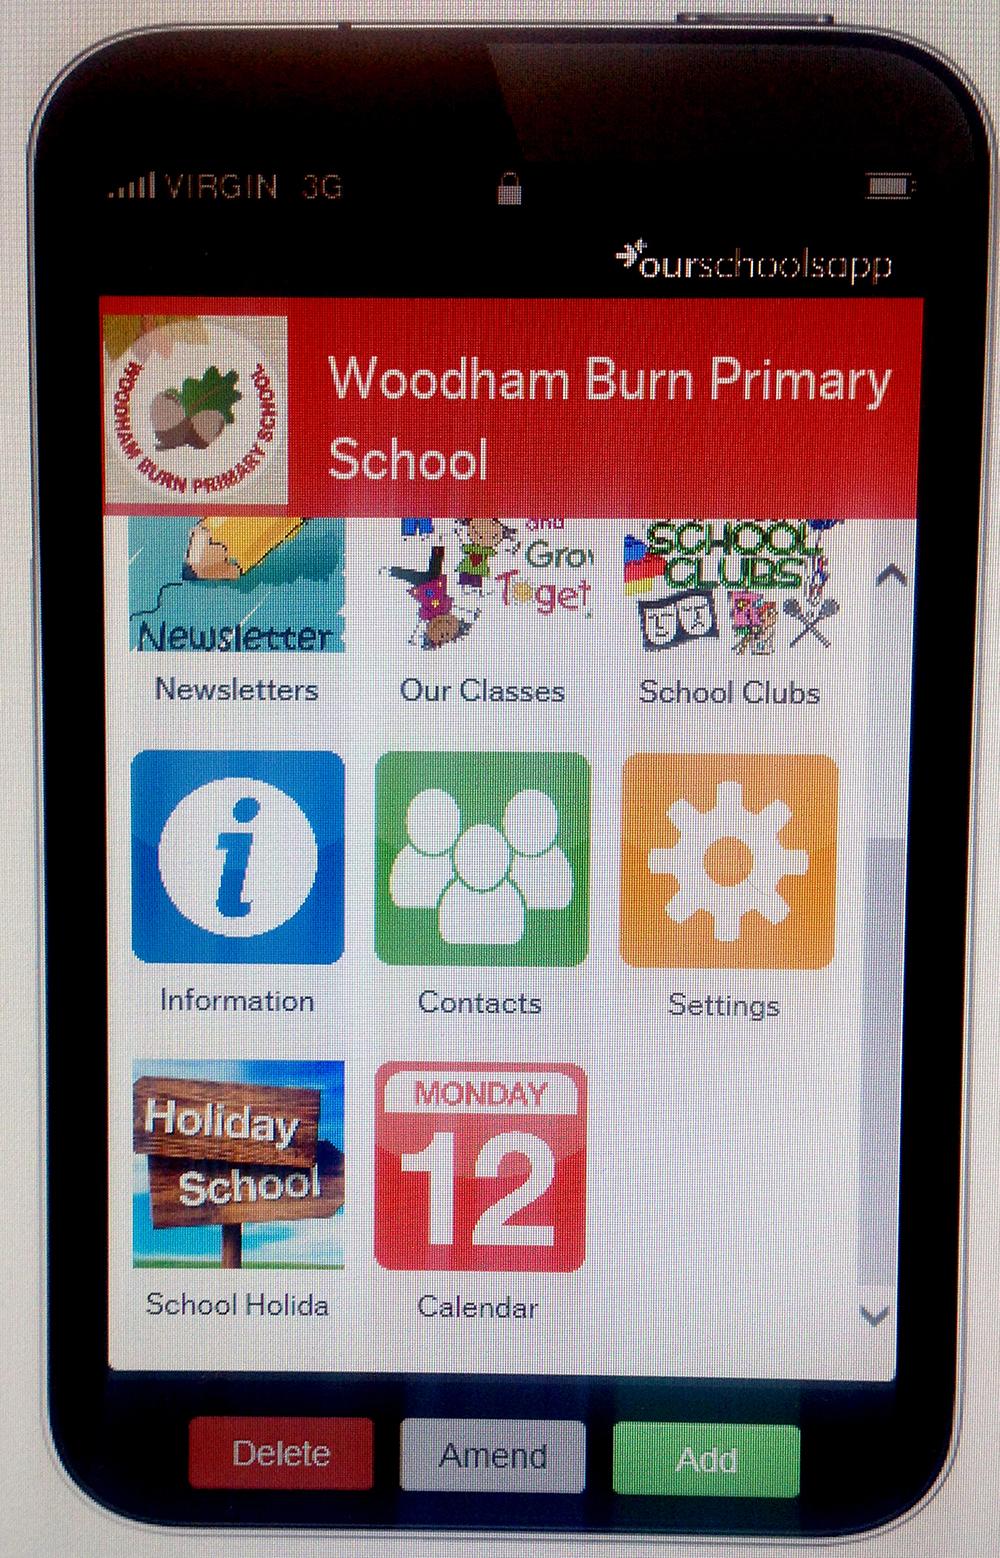 School App Aids Parent Contact